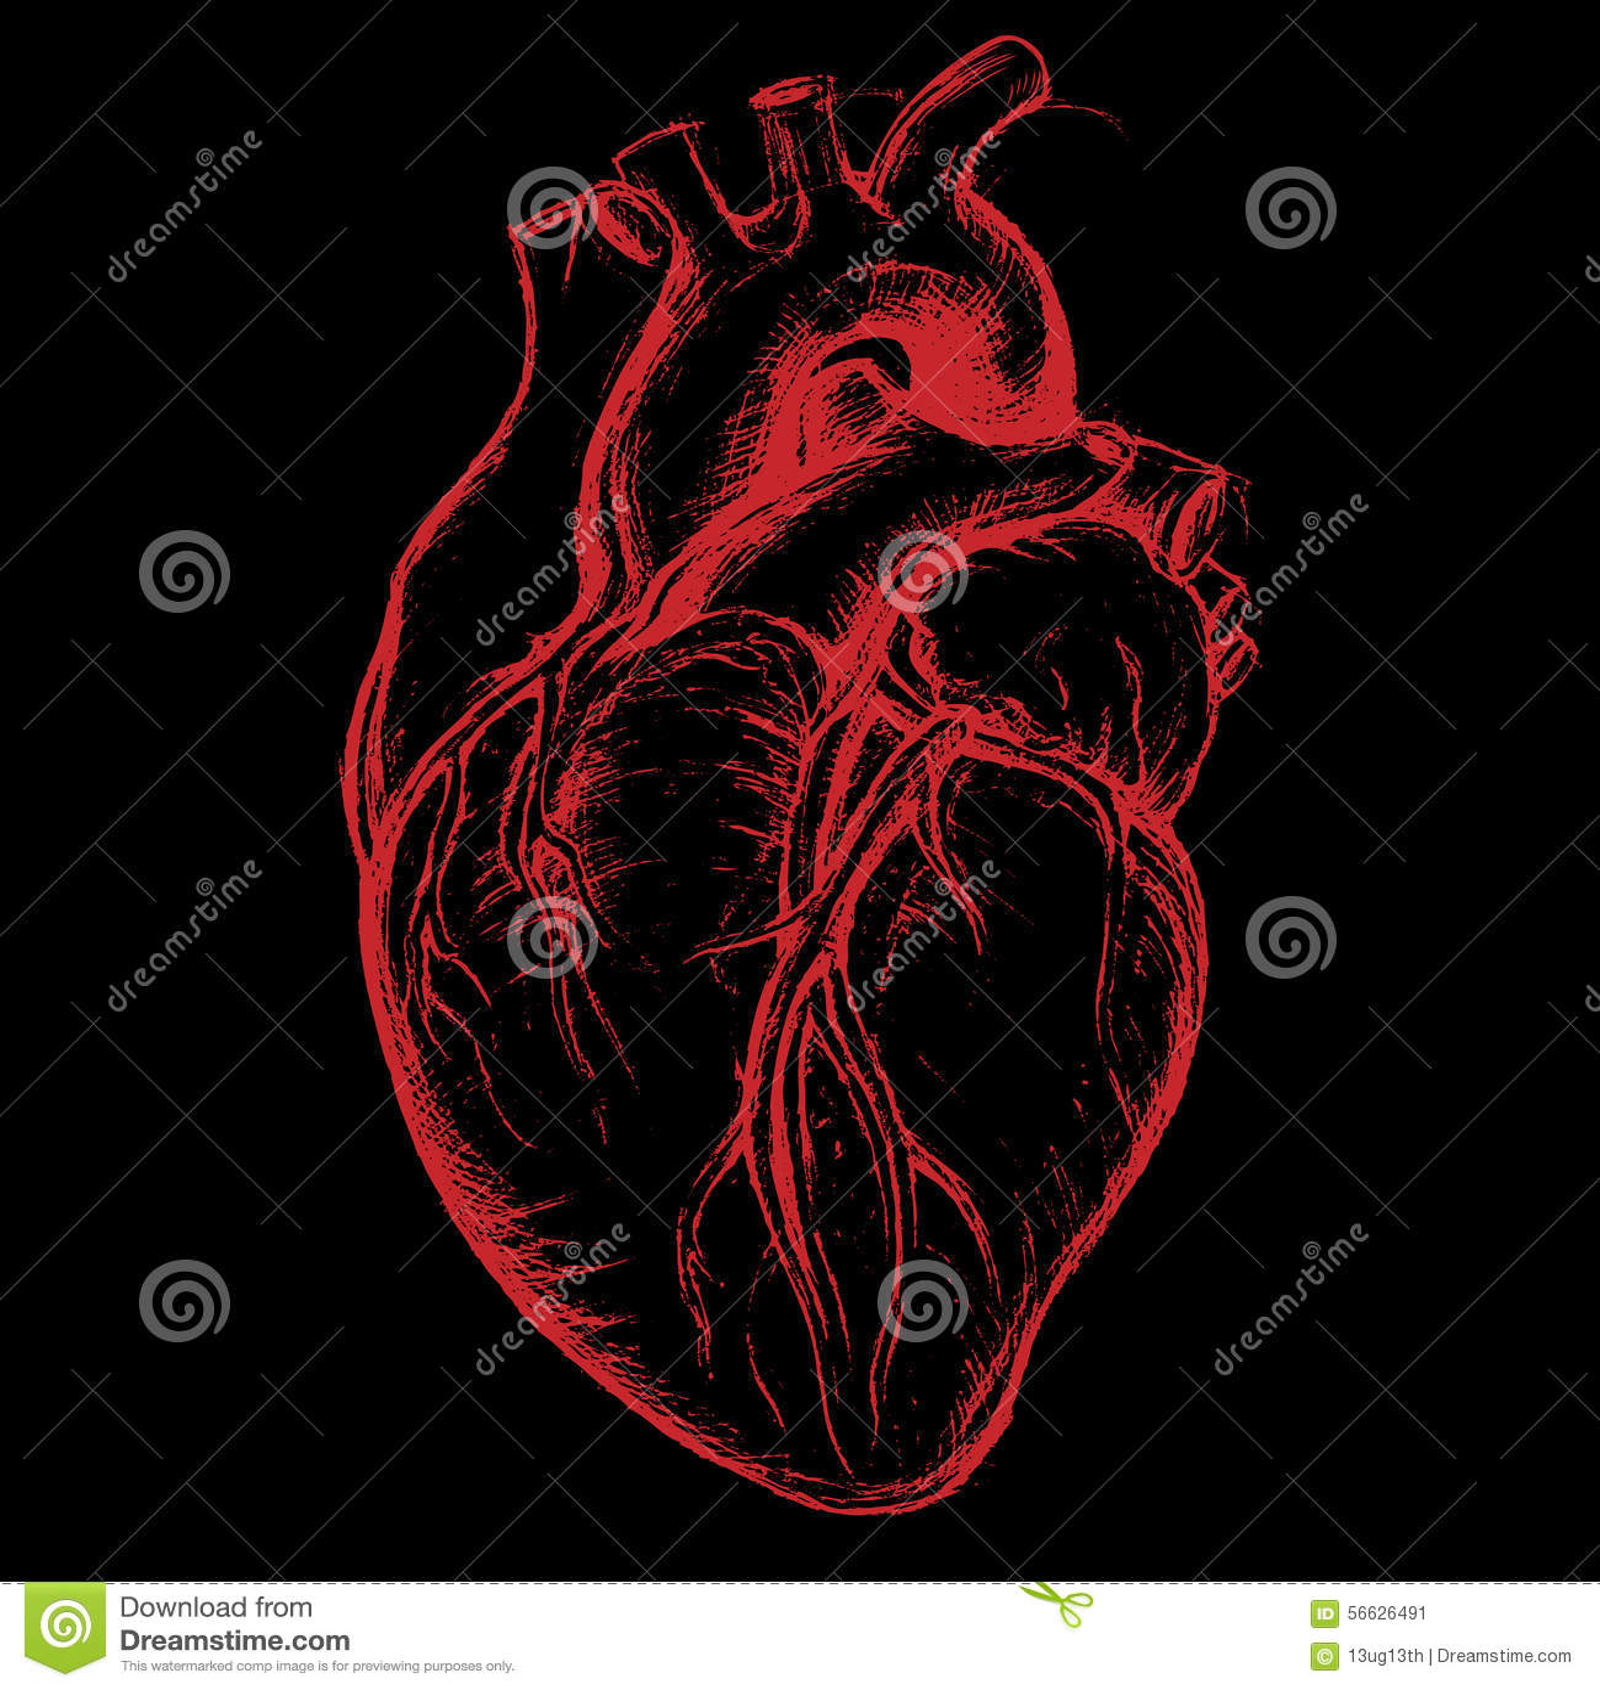 Dessin humain de coeur illustration de vecteur - Dessin coeur humain ...